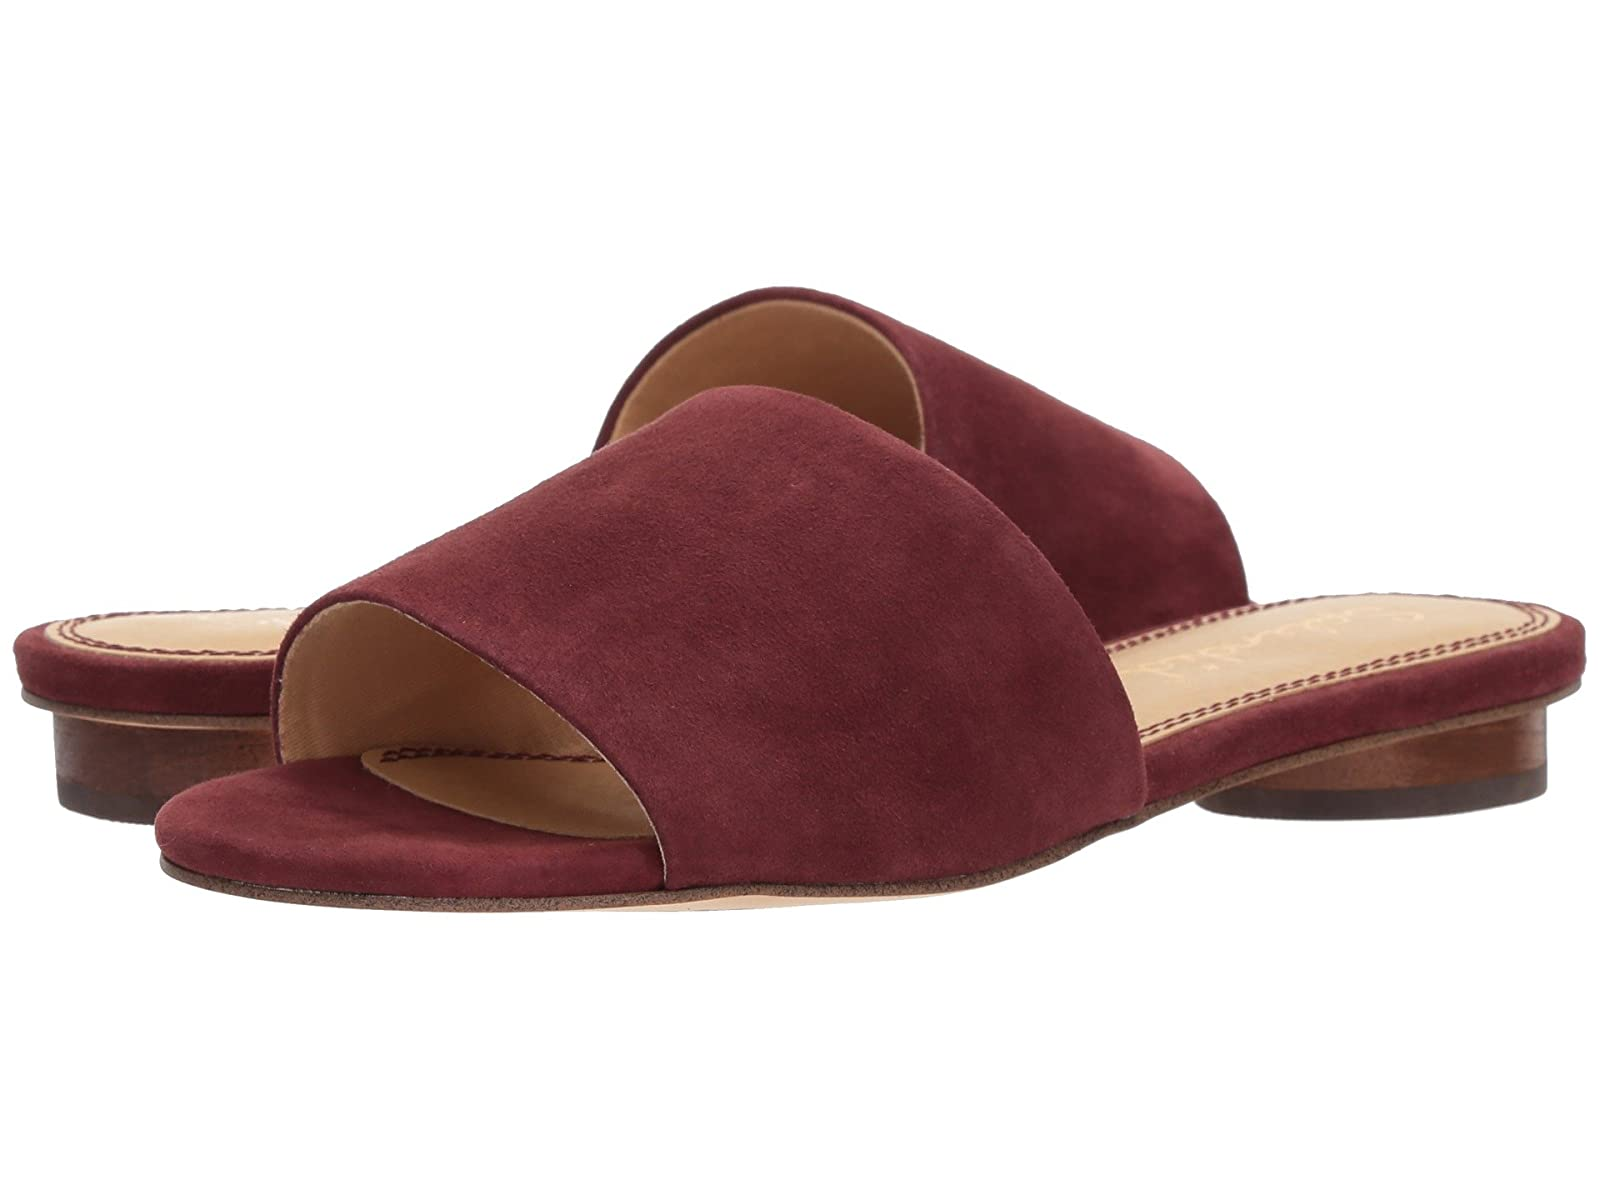 Splendid BetsyCheap and distinctive eye-catching shoes